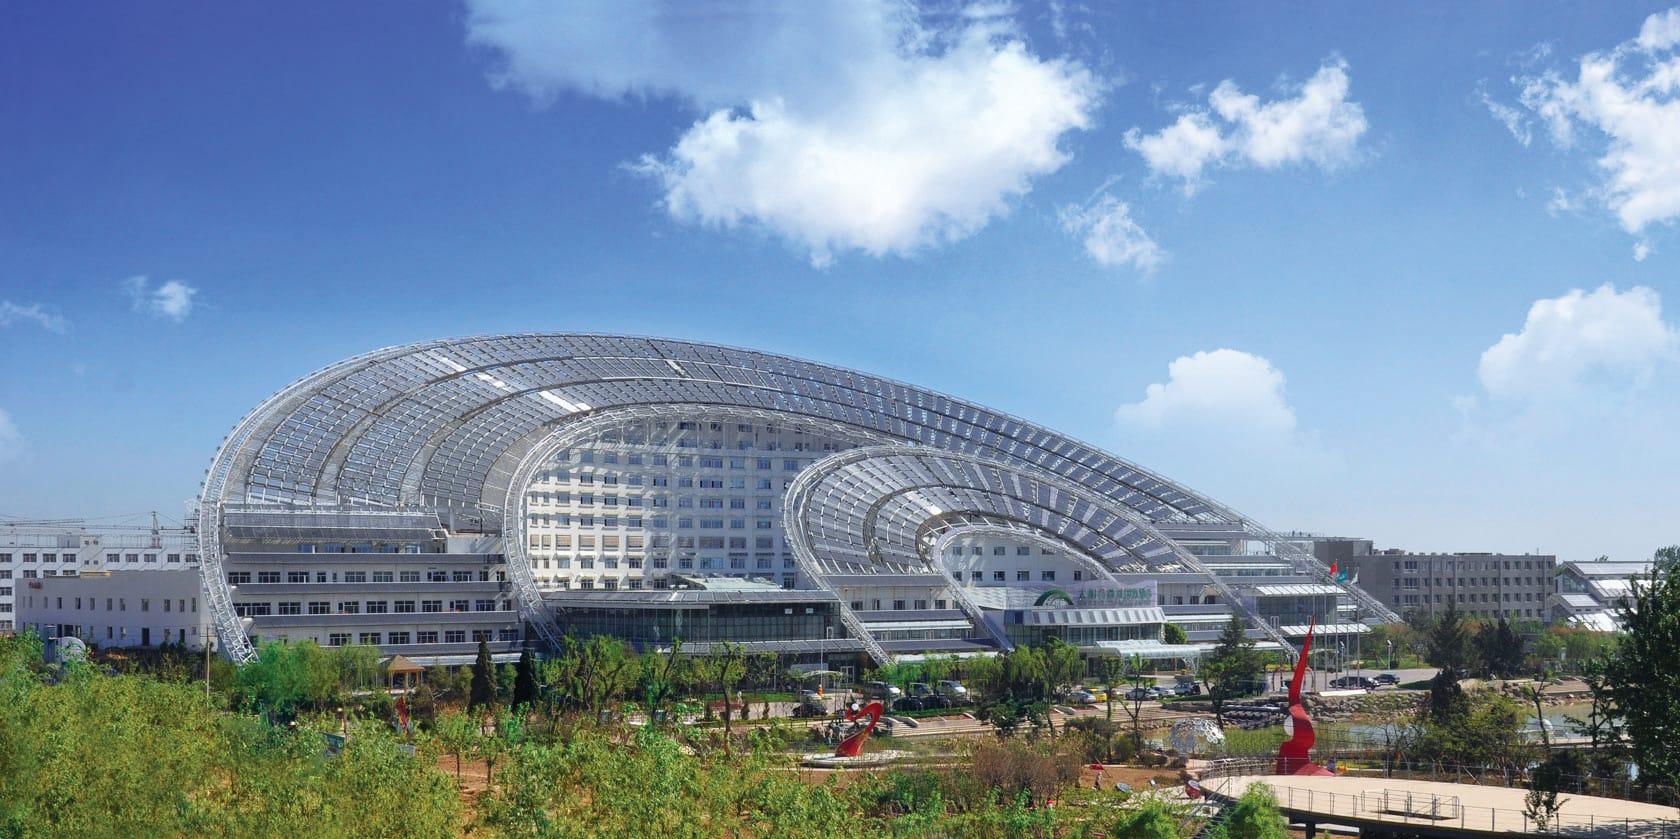 The Micro Emission Sun-Moon Mansion, China